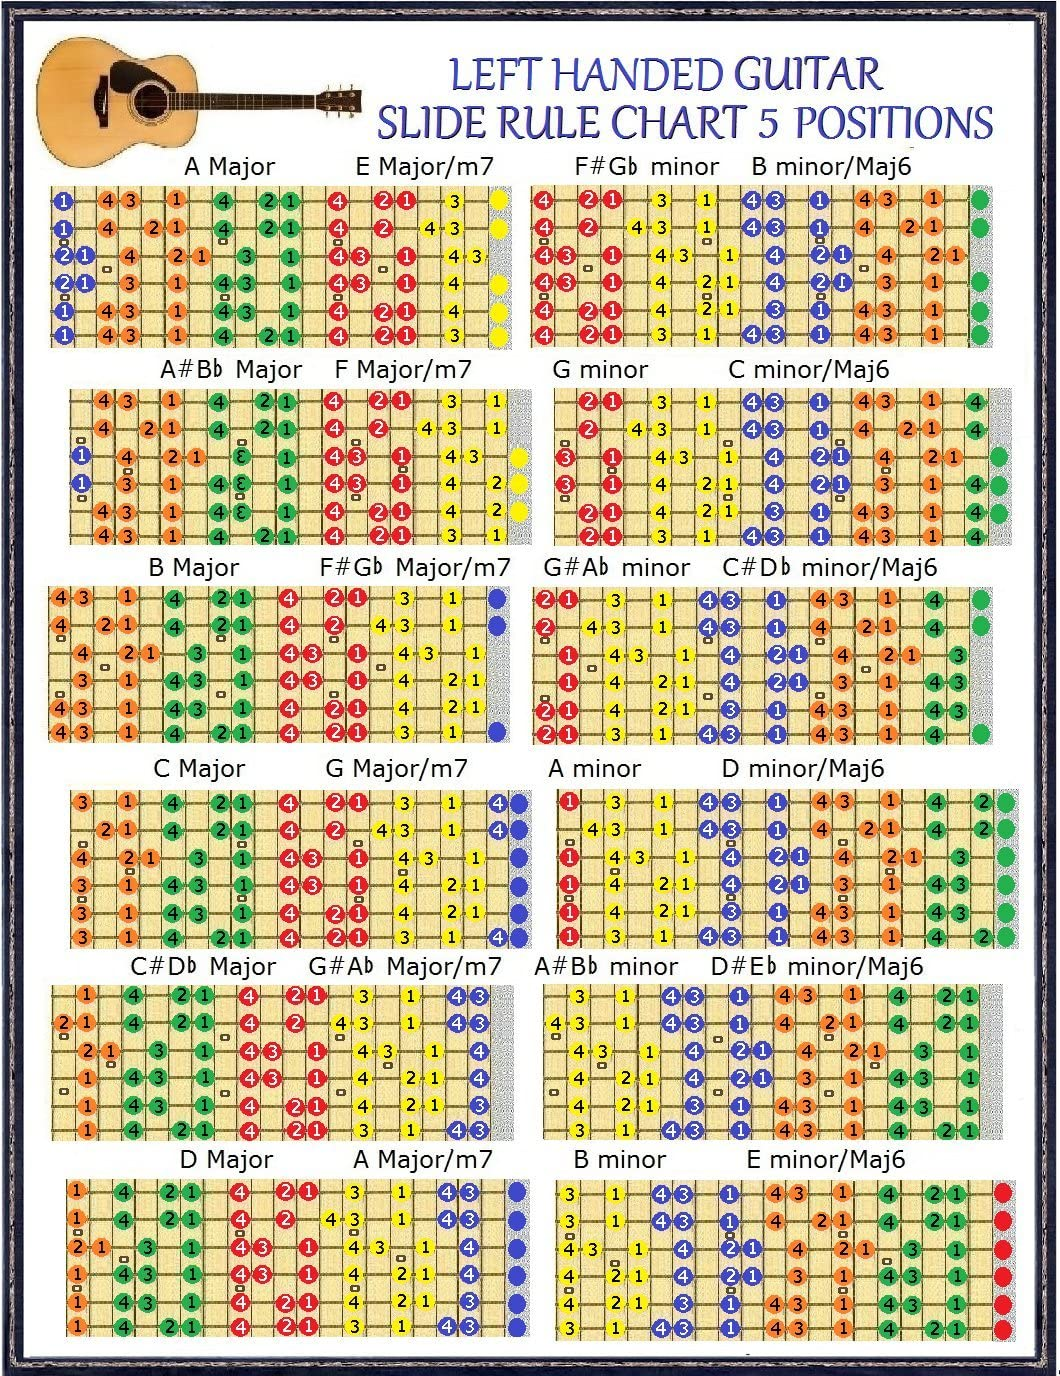 LEFT HANDED LEAD GUITAR SLIDE RULE CHART - 5 POSITIONS